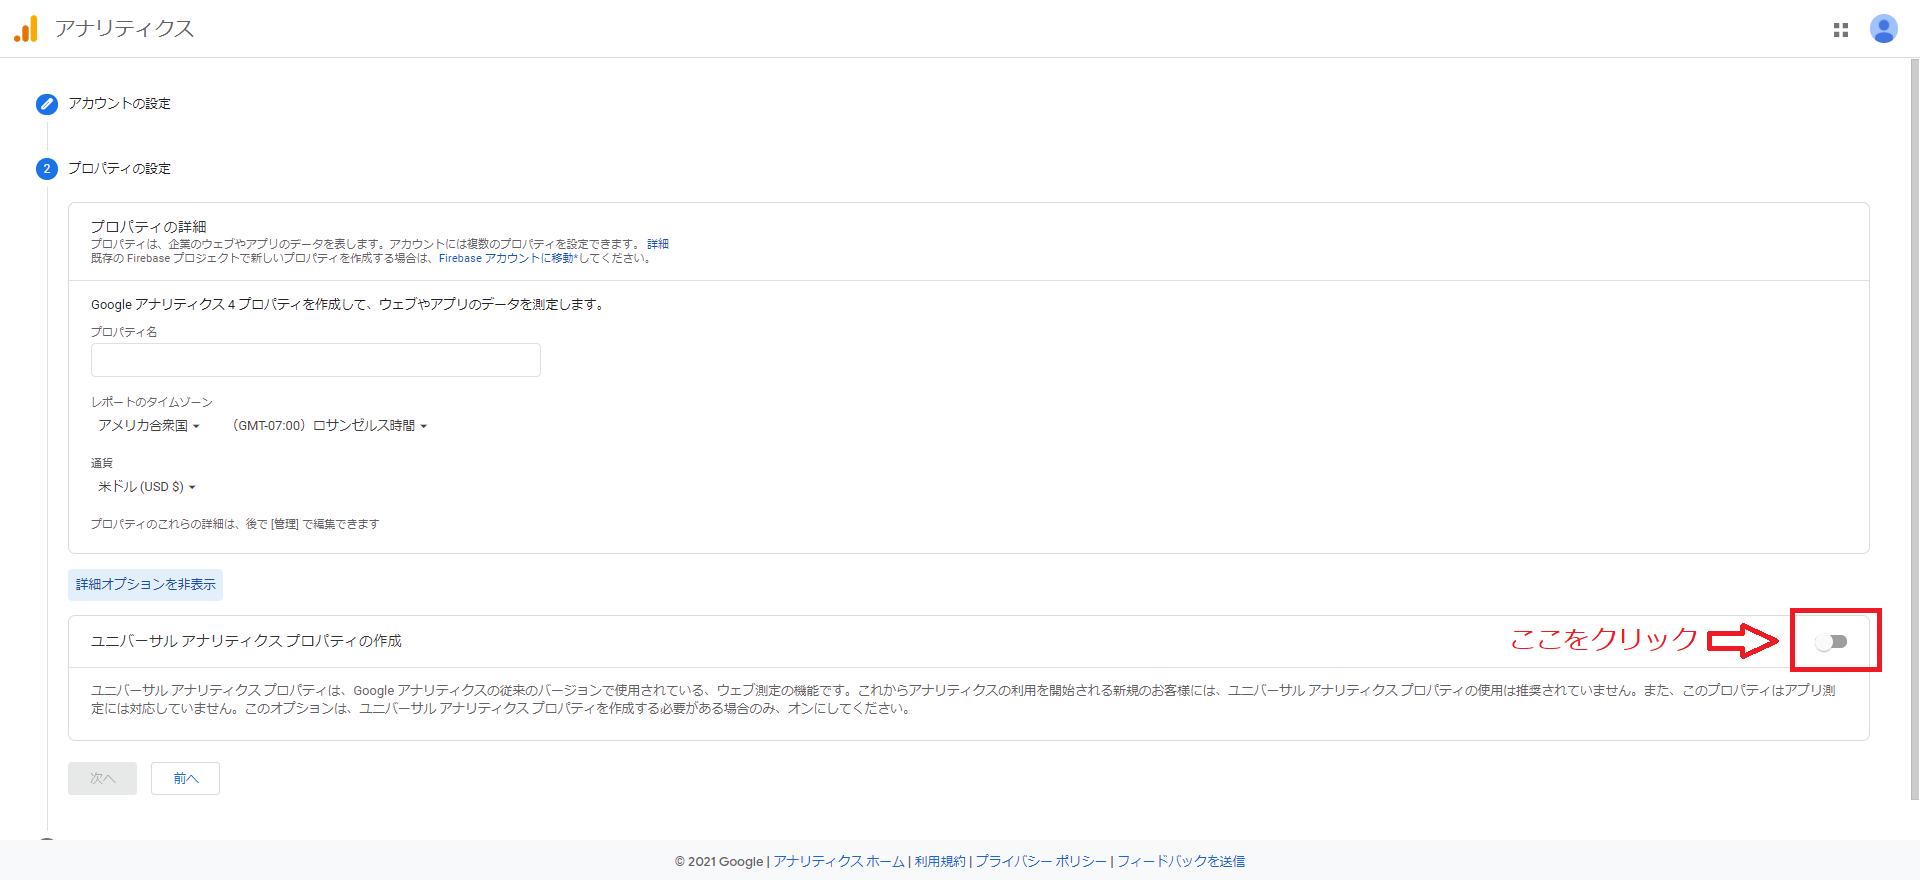 Googleアナリティクス プロパティの設定 プロパティの詳細 詳細オプション